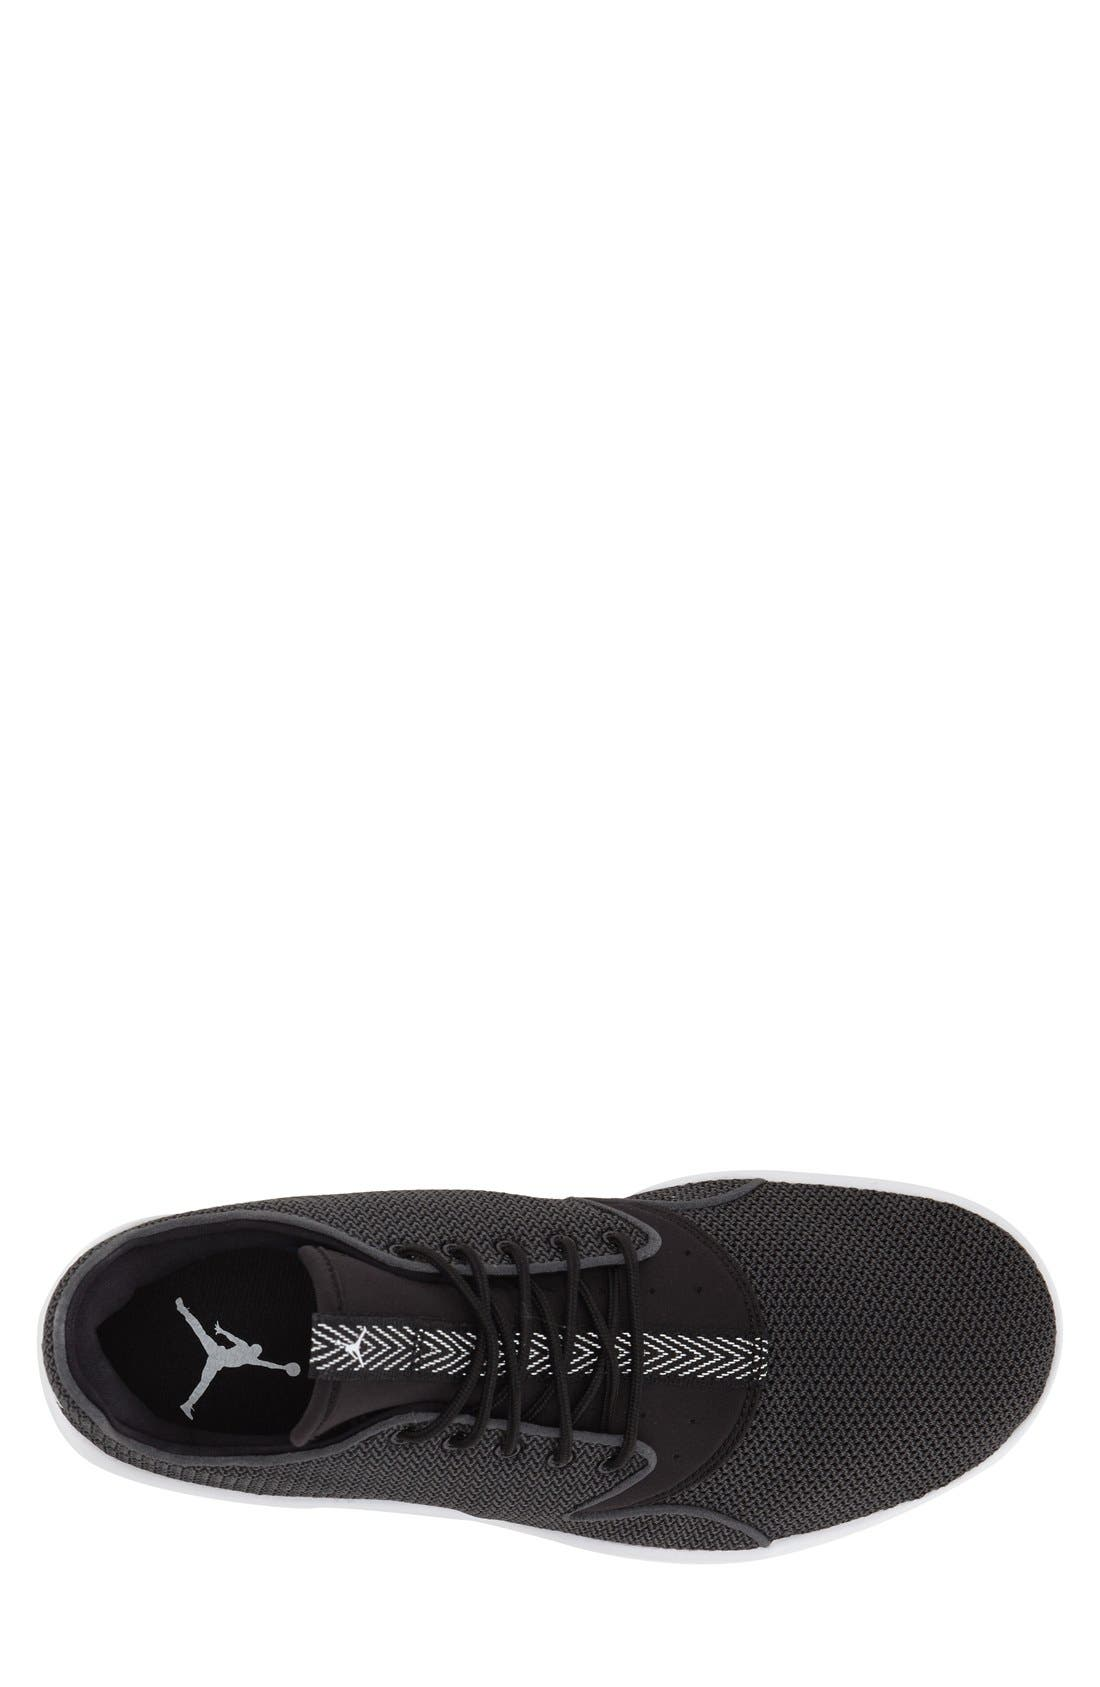 Alternate Image 3  - Nike 'Jordan Eclipse' Sneaker (Men)